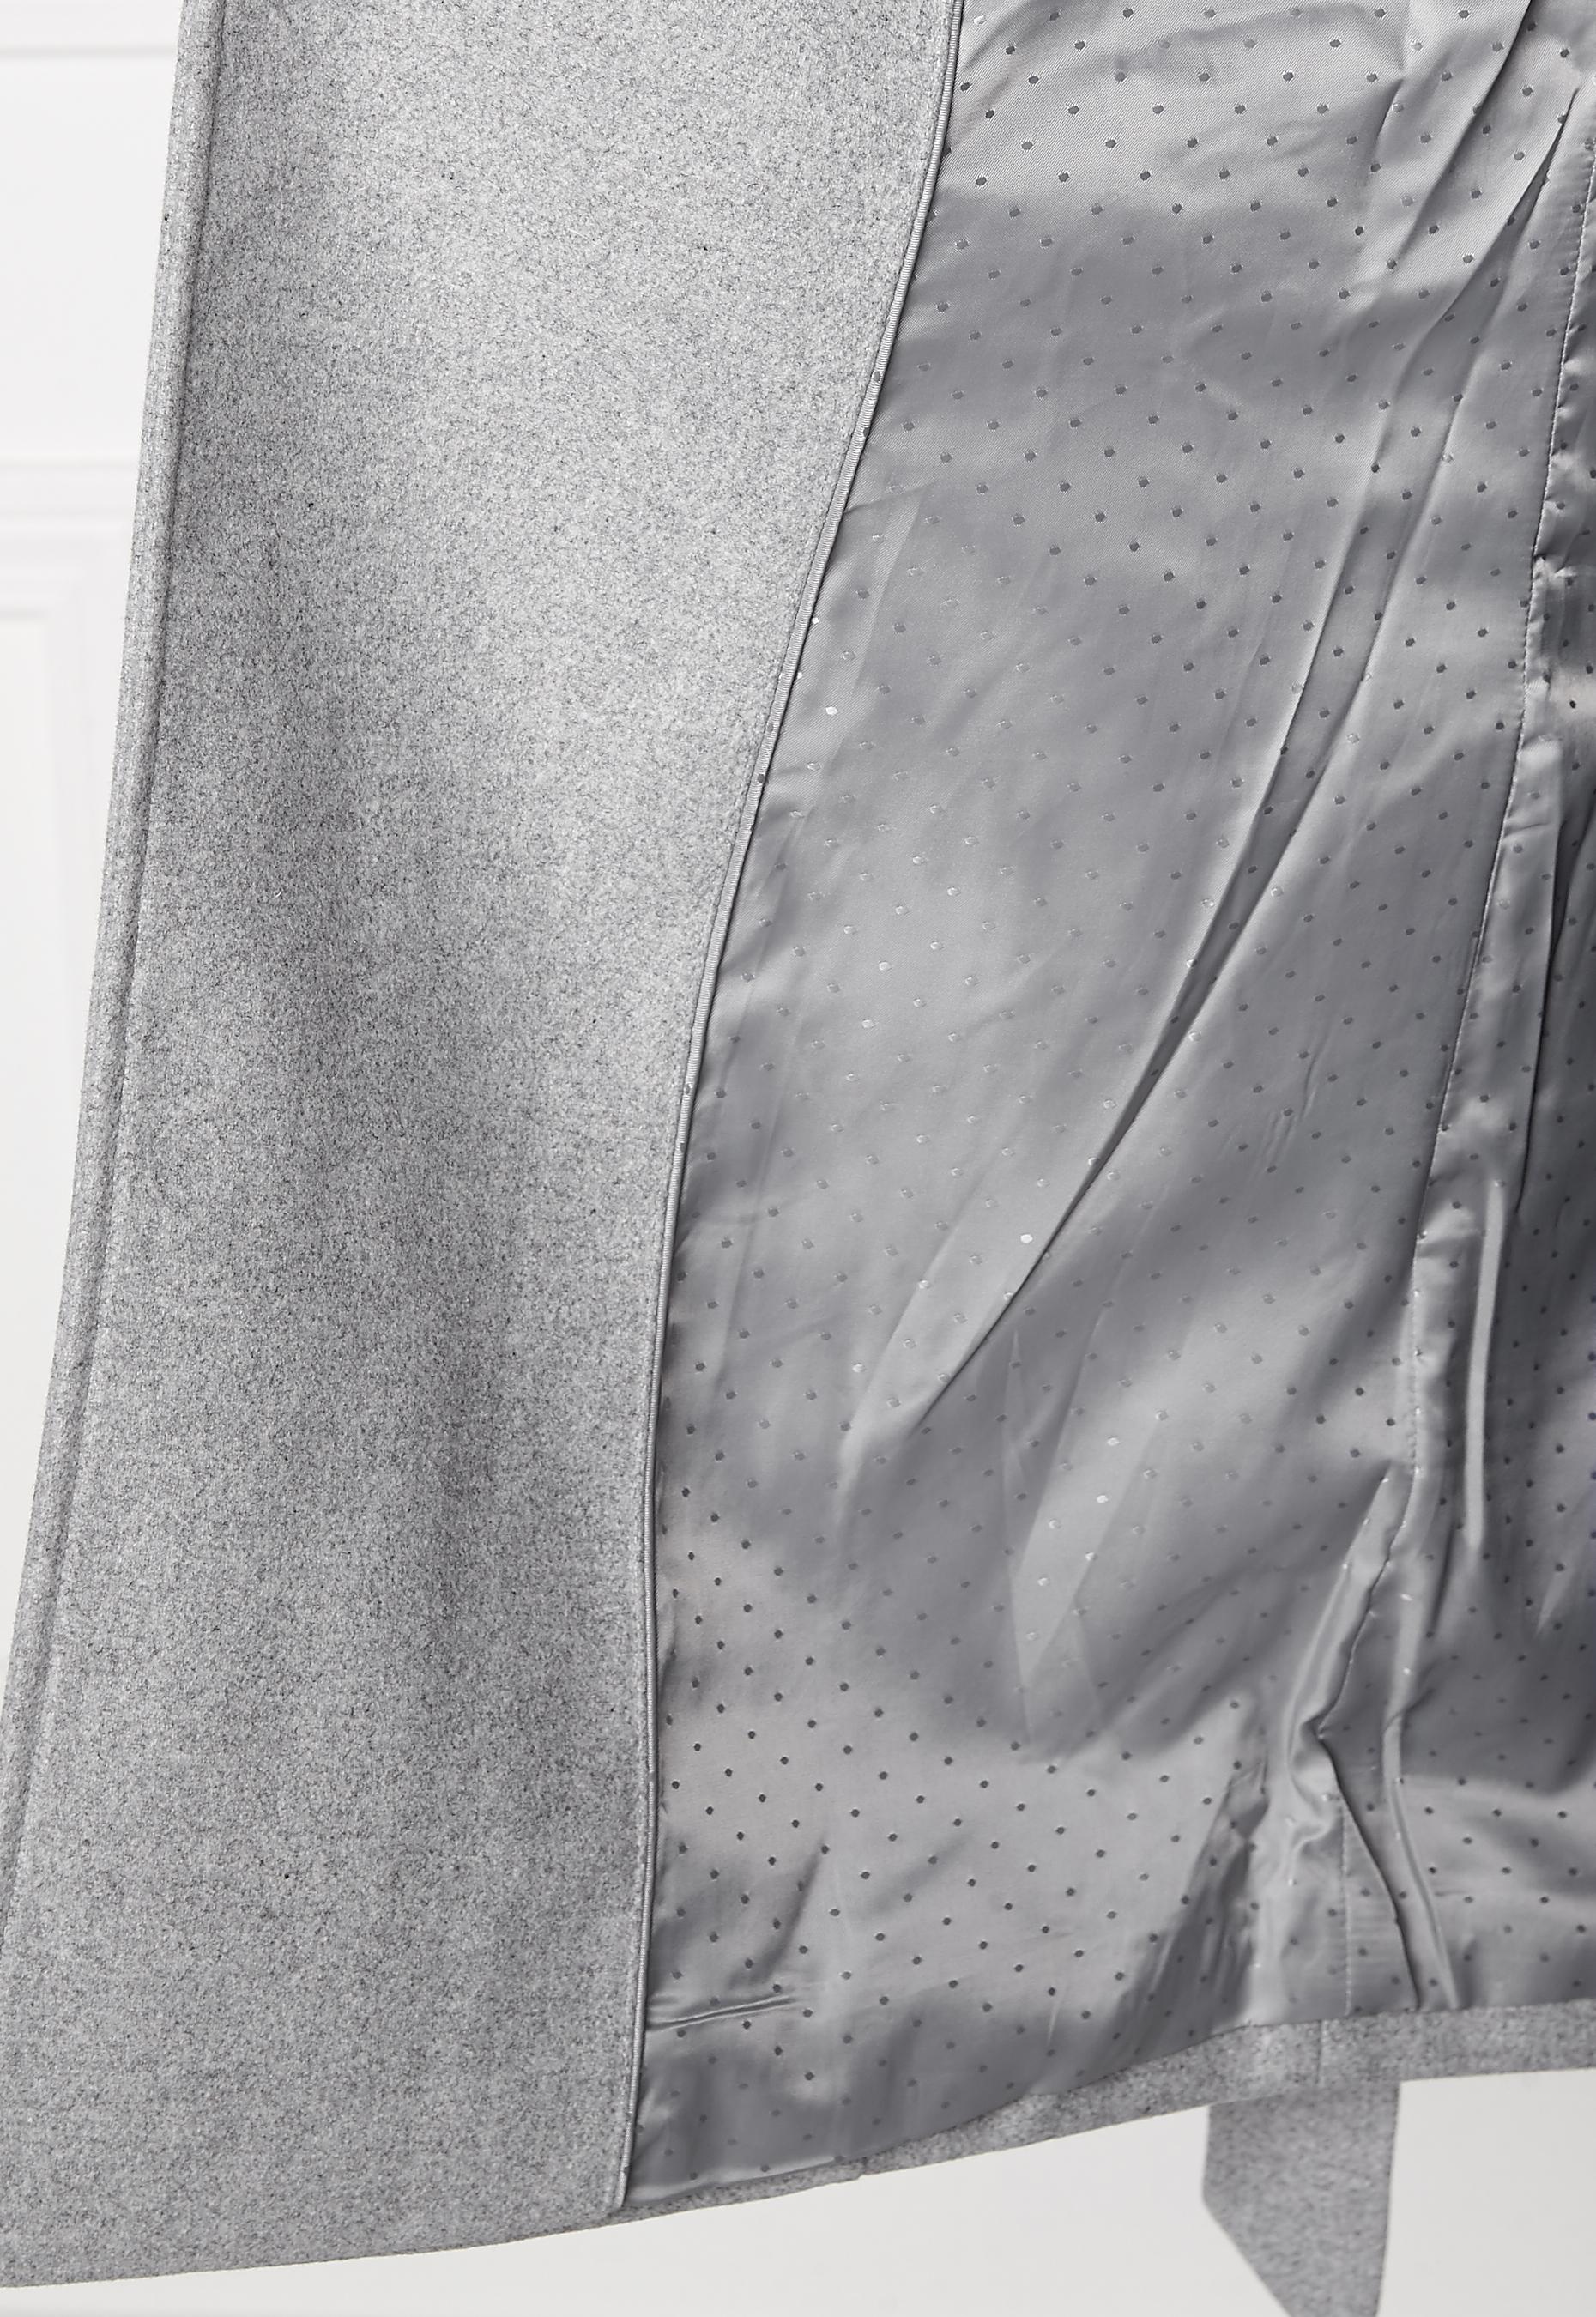 VILA Director Jacket Light Grey Melange - Bubbleroom 7cb60f94ec